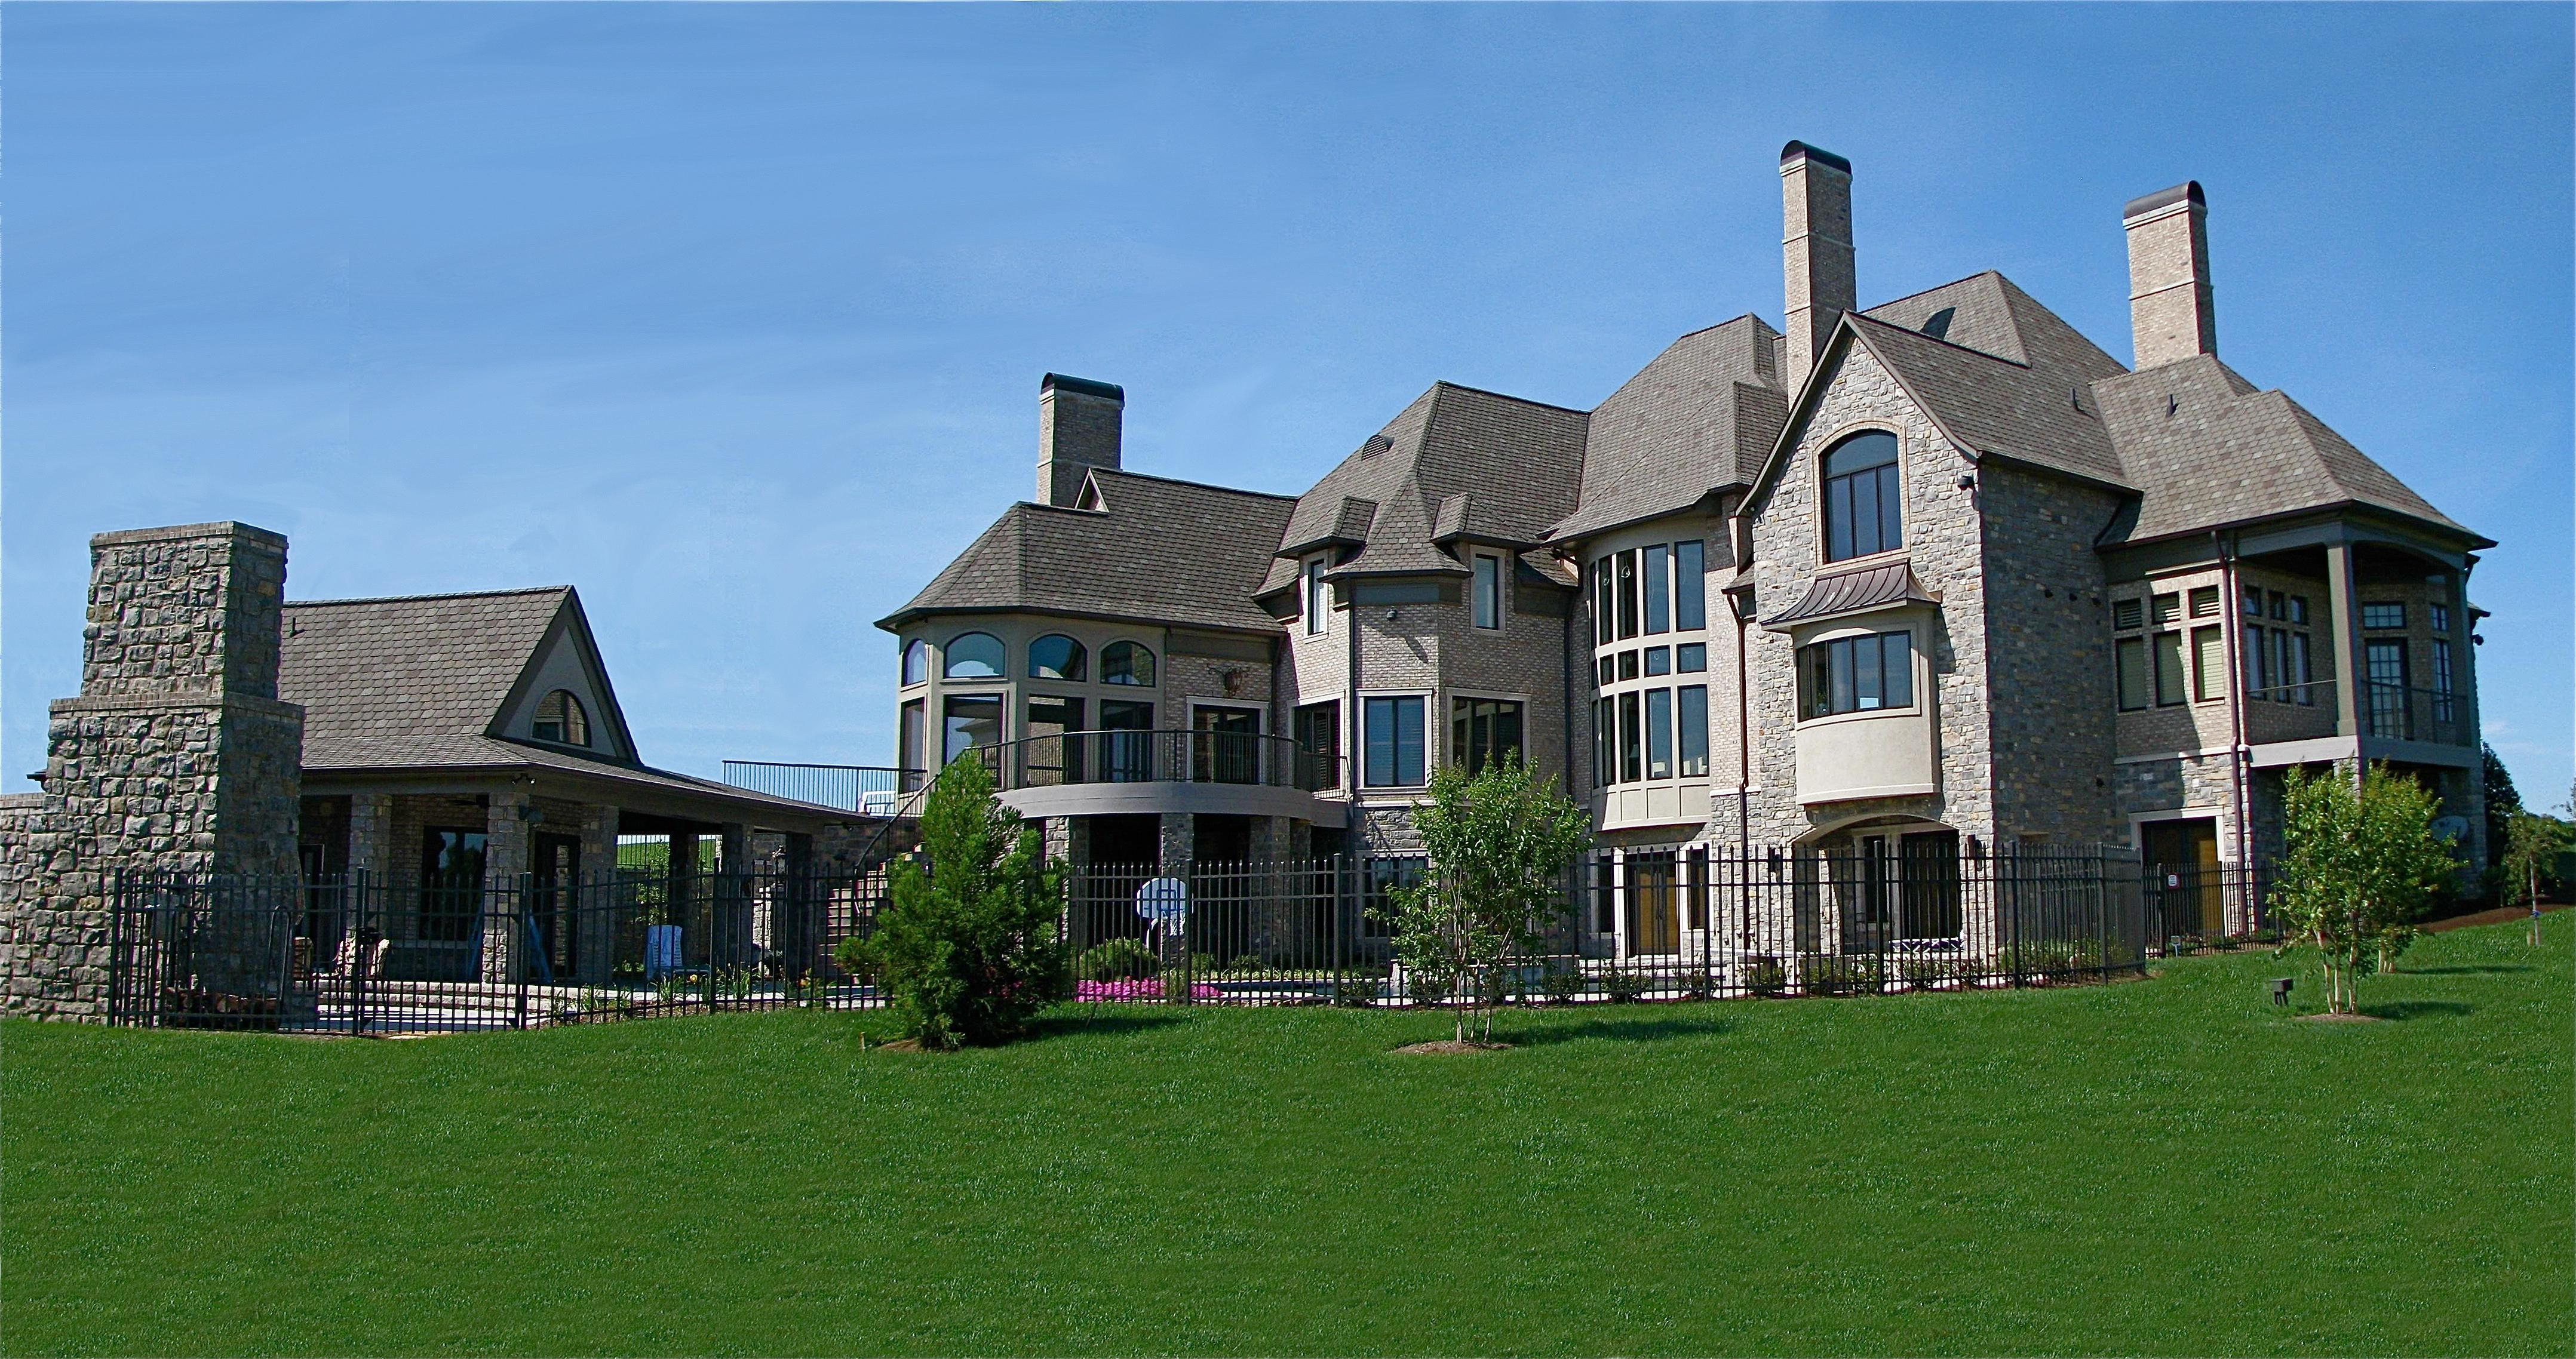 Bon Stone Crest Manor | Stephen Davis Home Design